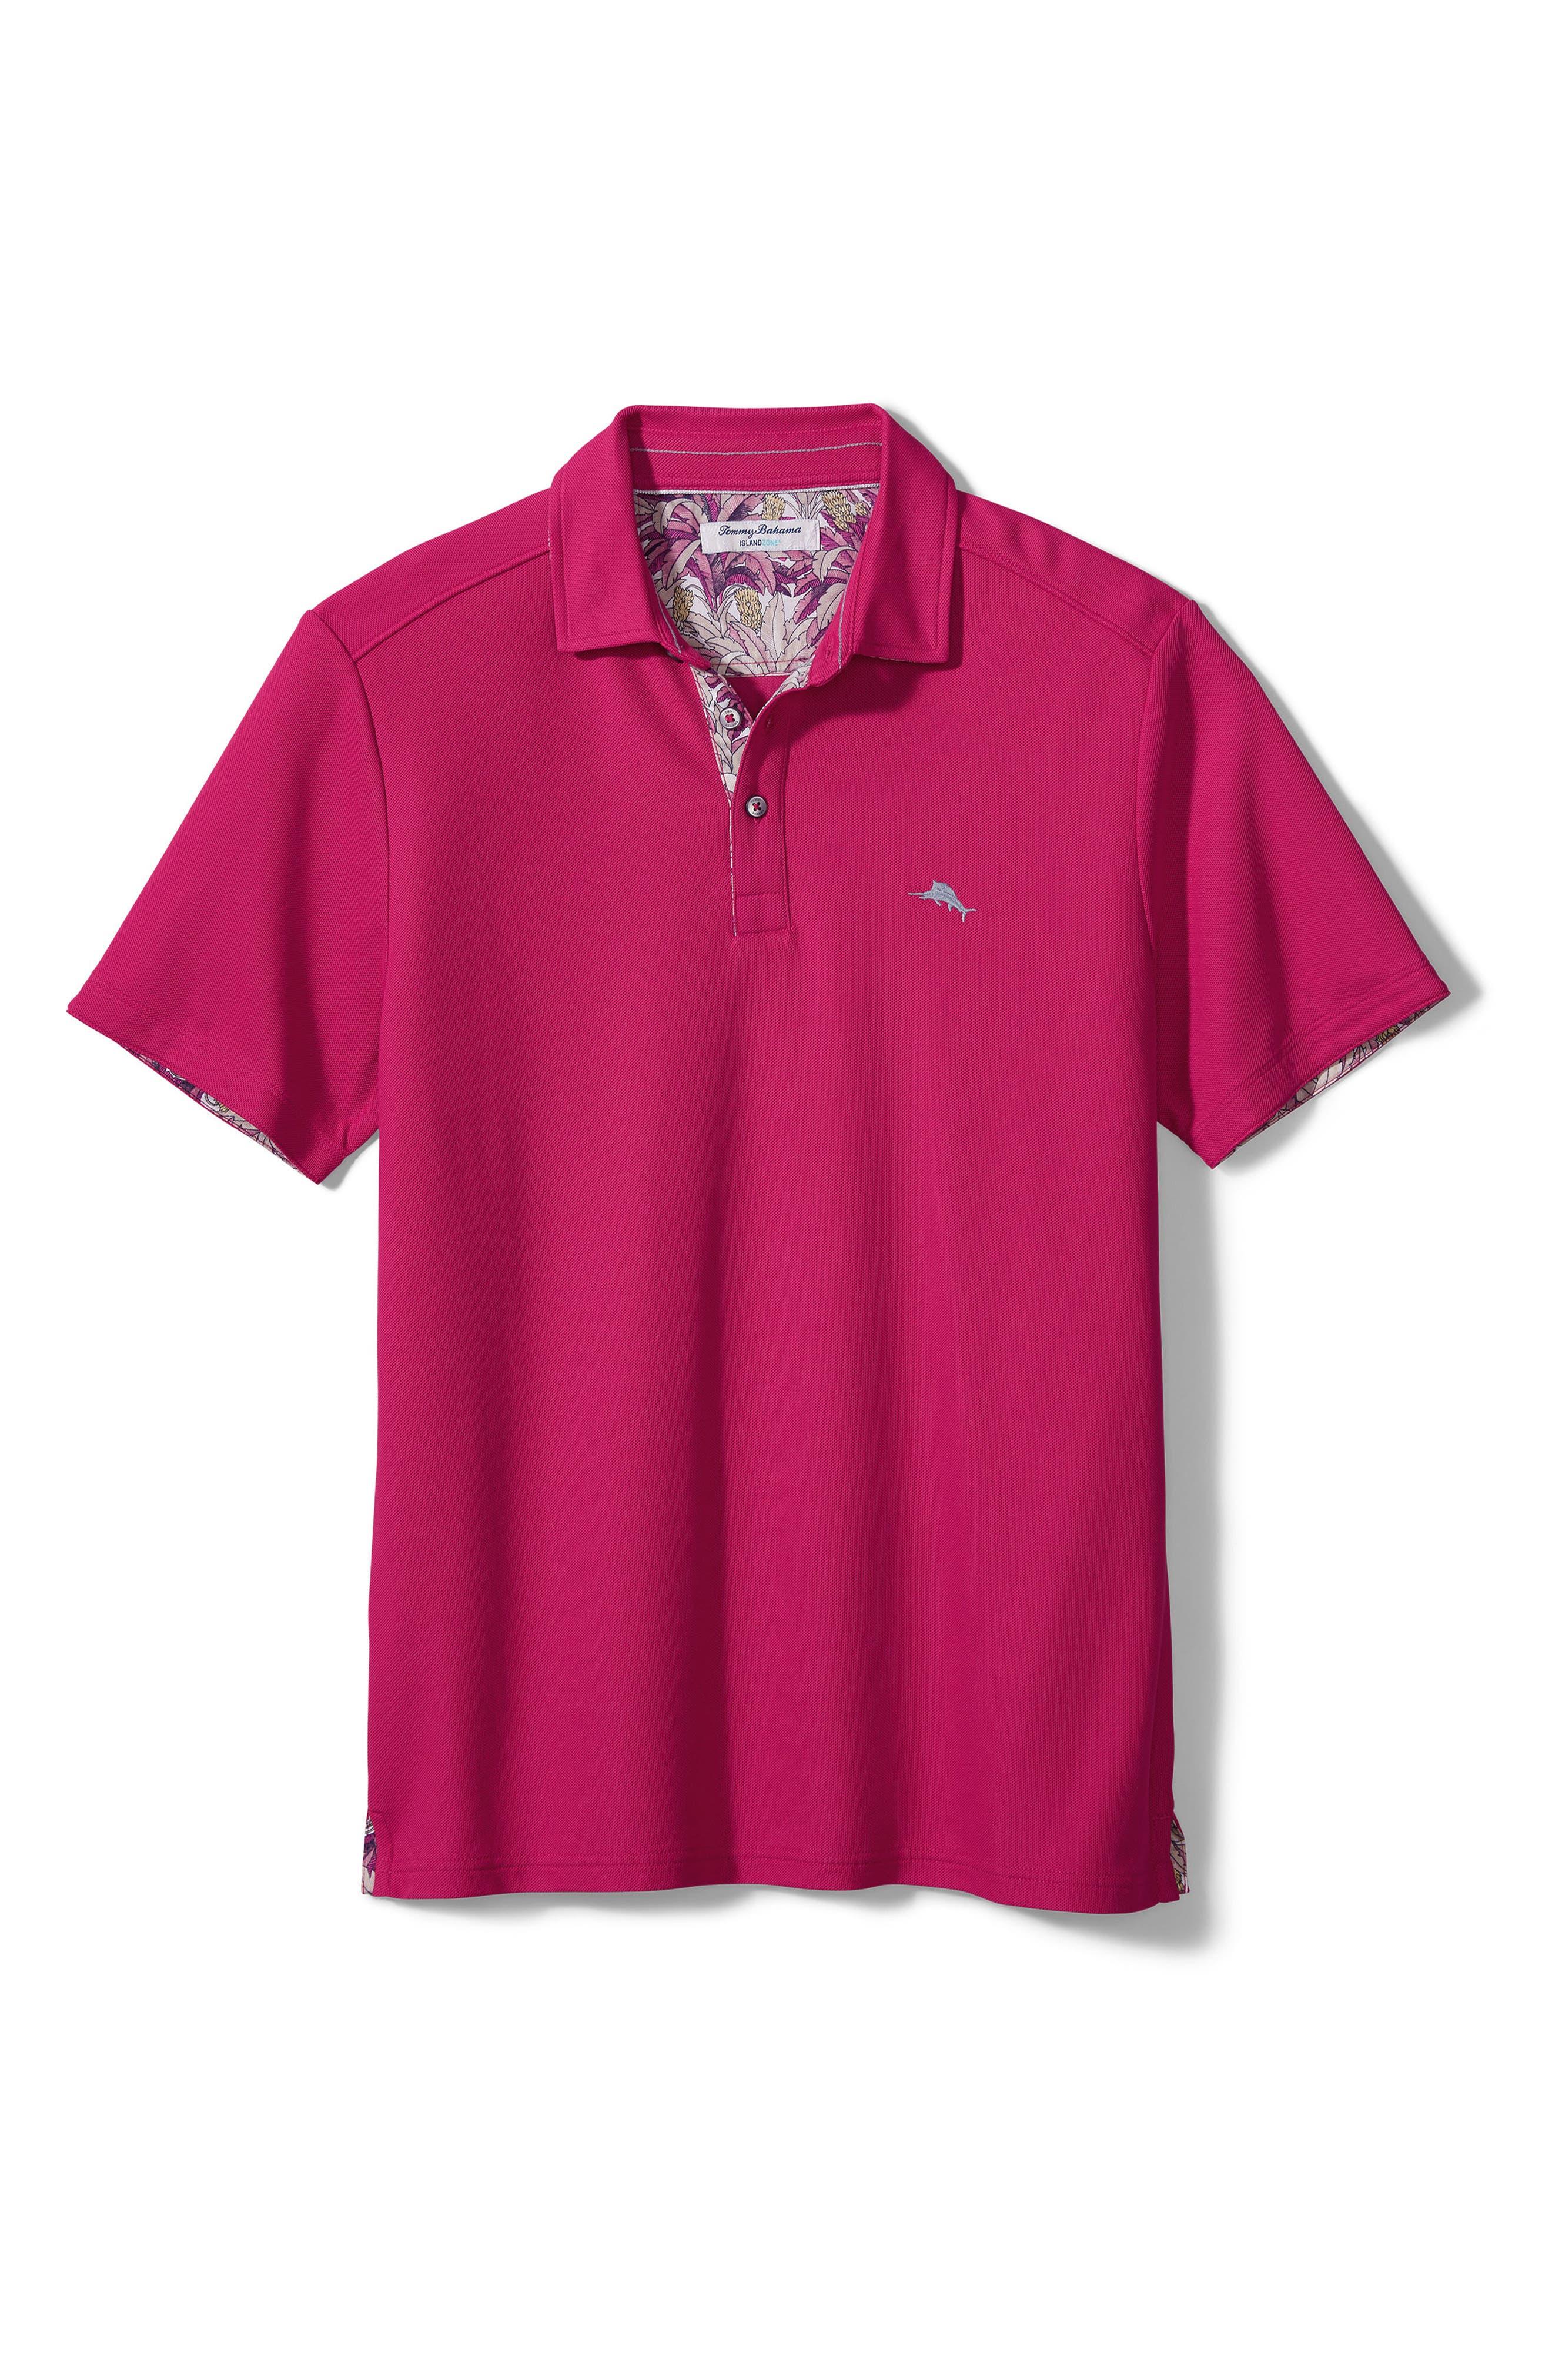 Men's Big & Tall Tommy Bahama Five O' Clock Tropic Short Sleeve Pique Performance Polo Shirt